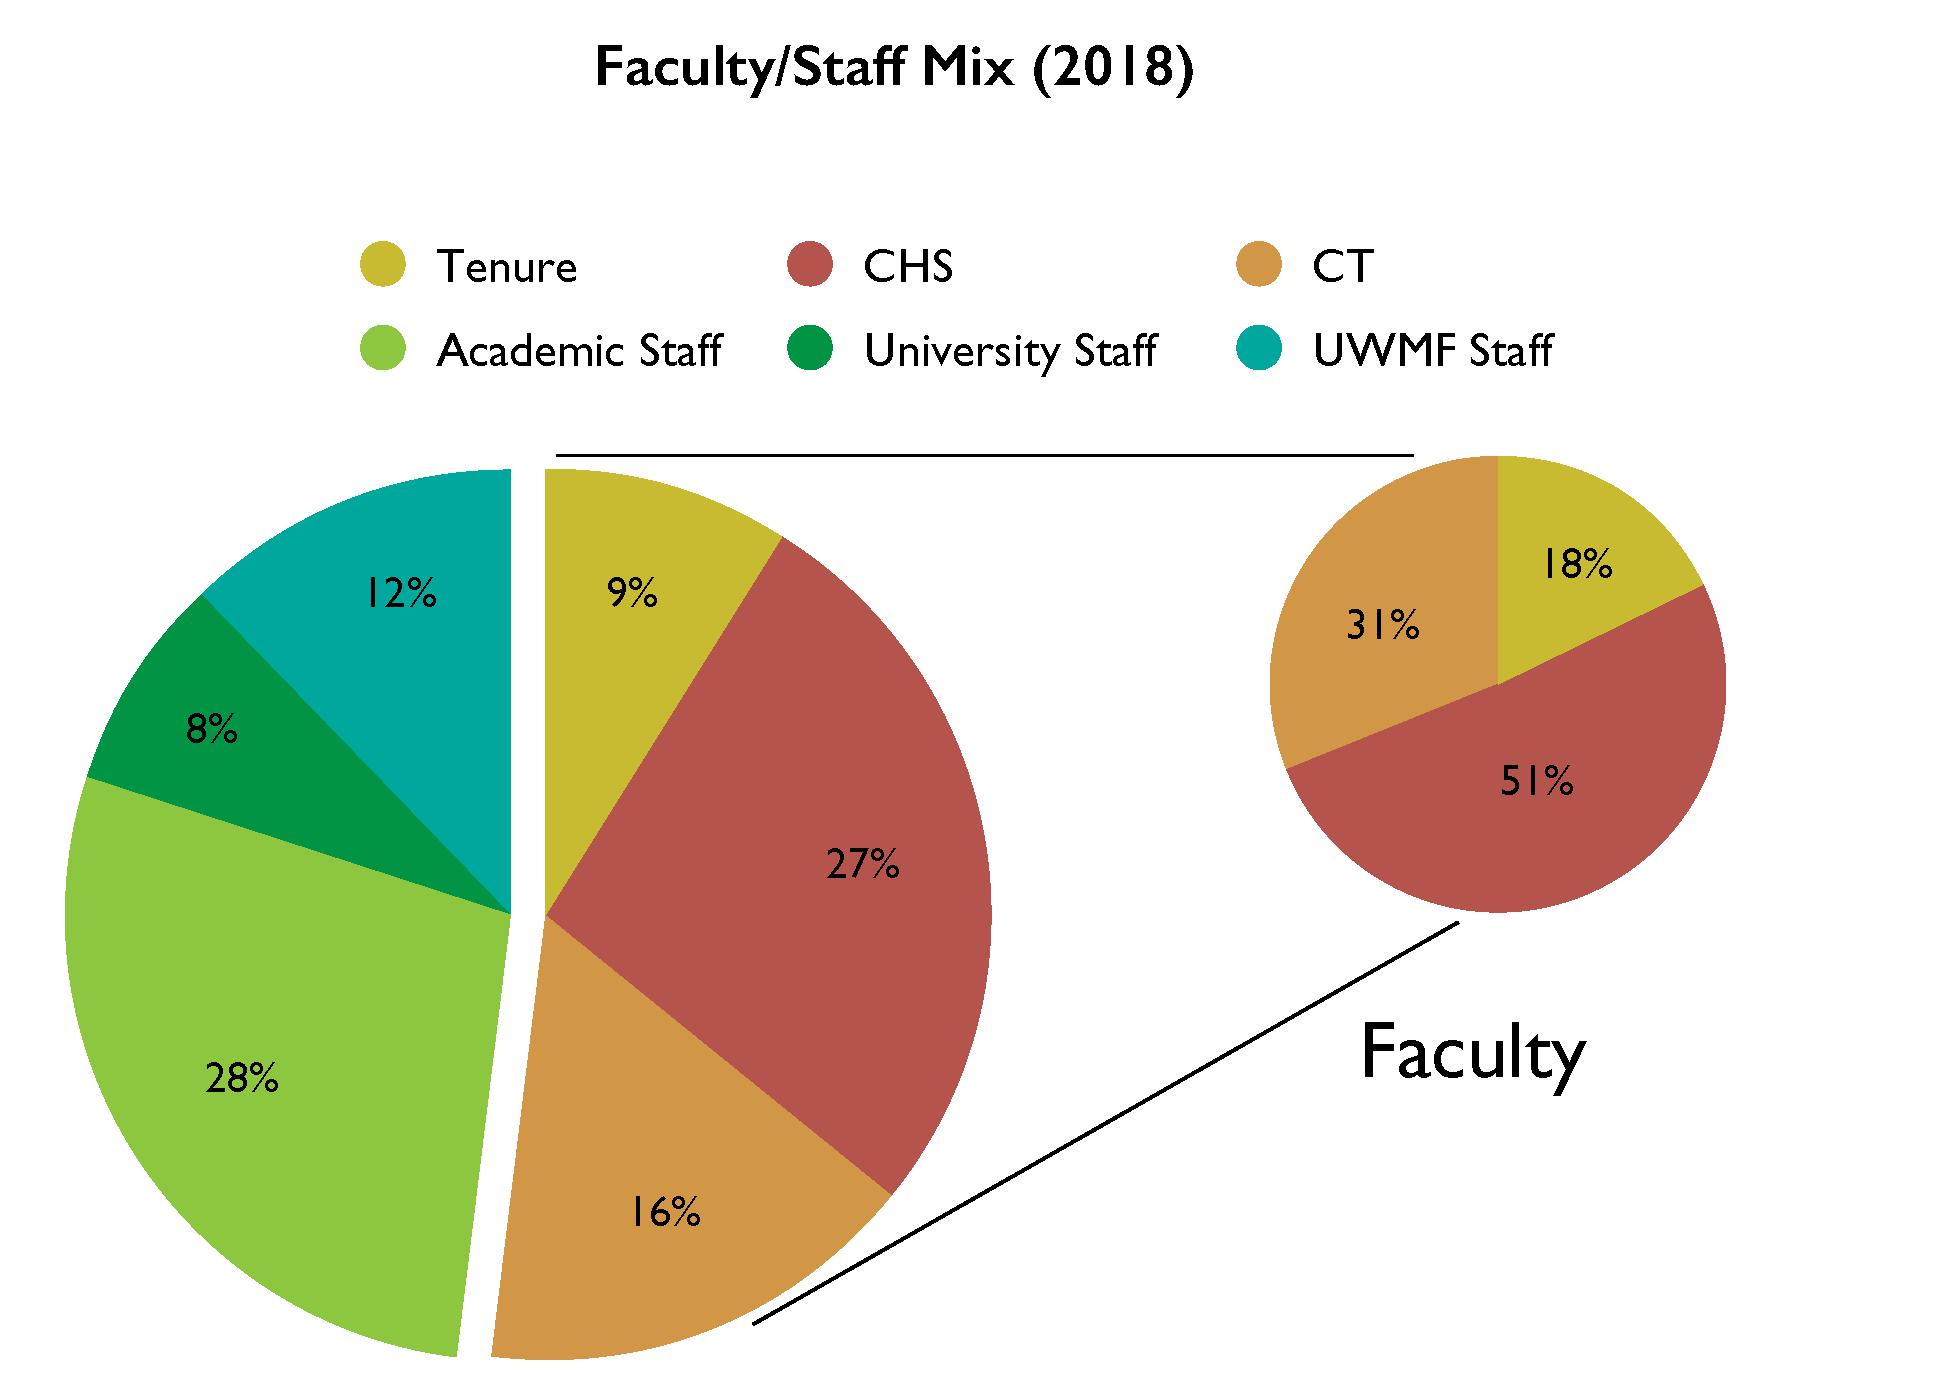 Staff Mix AR 2019 pie chart